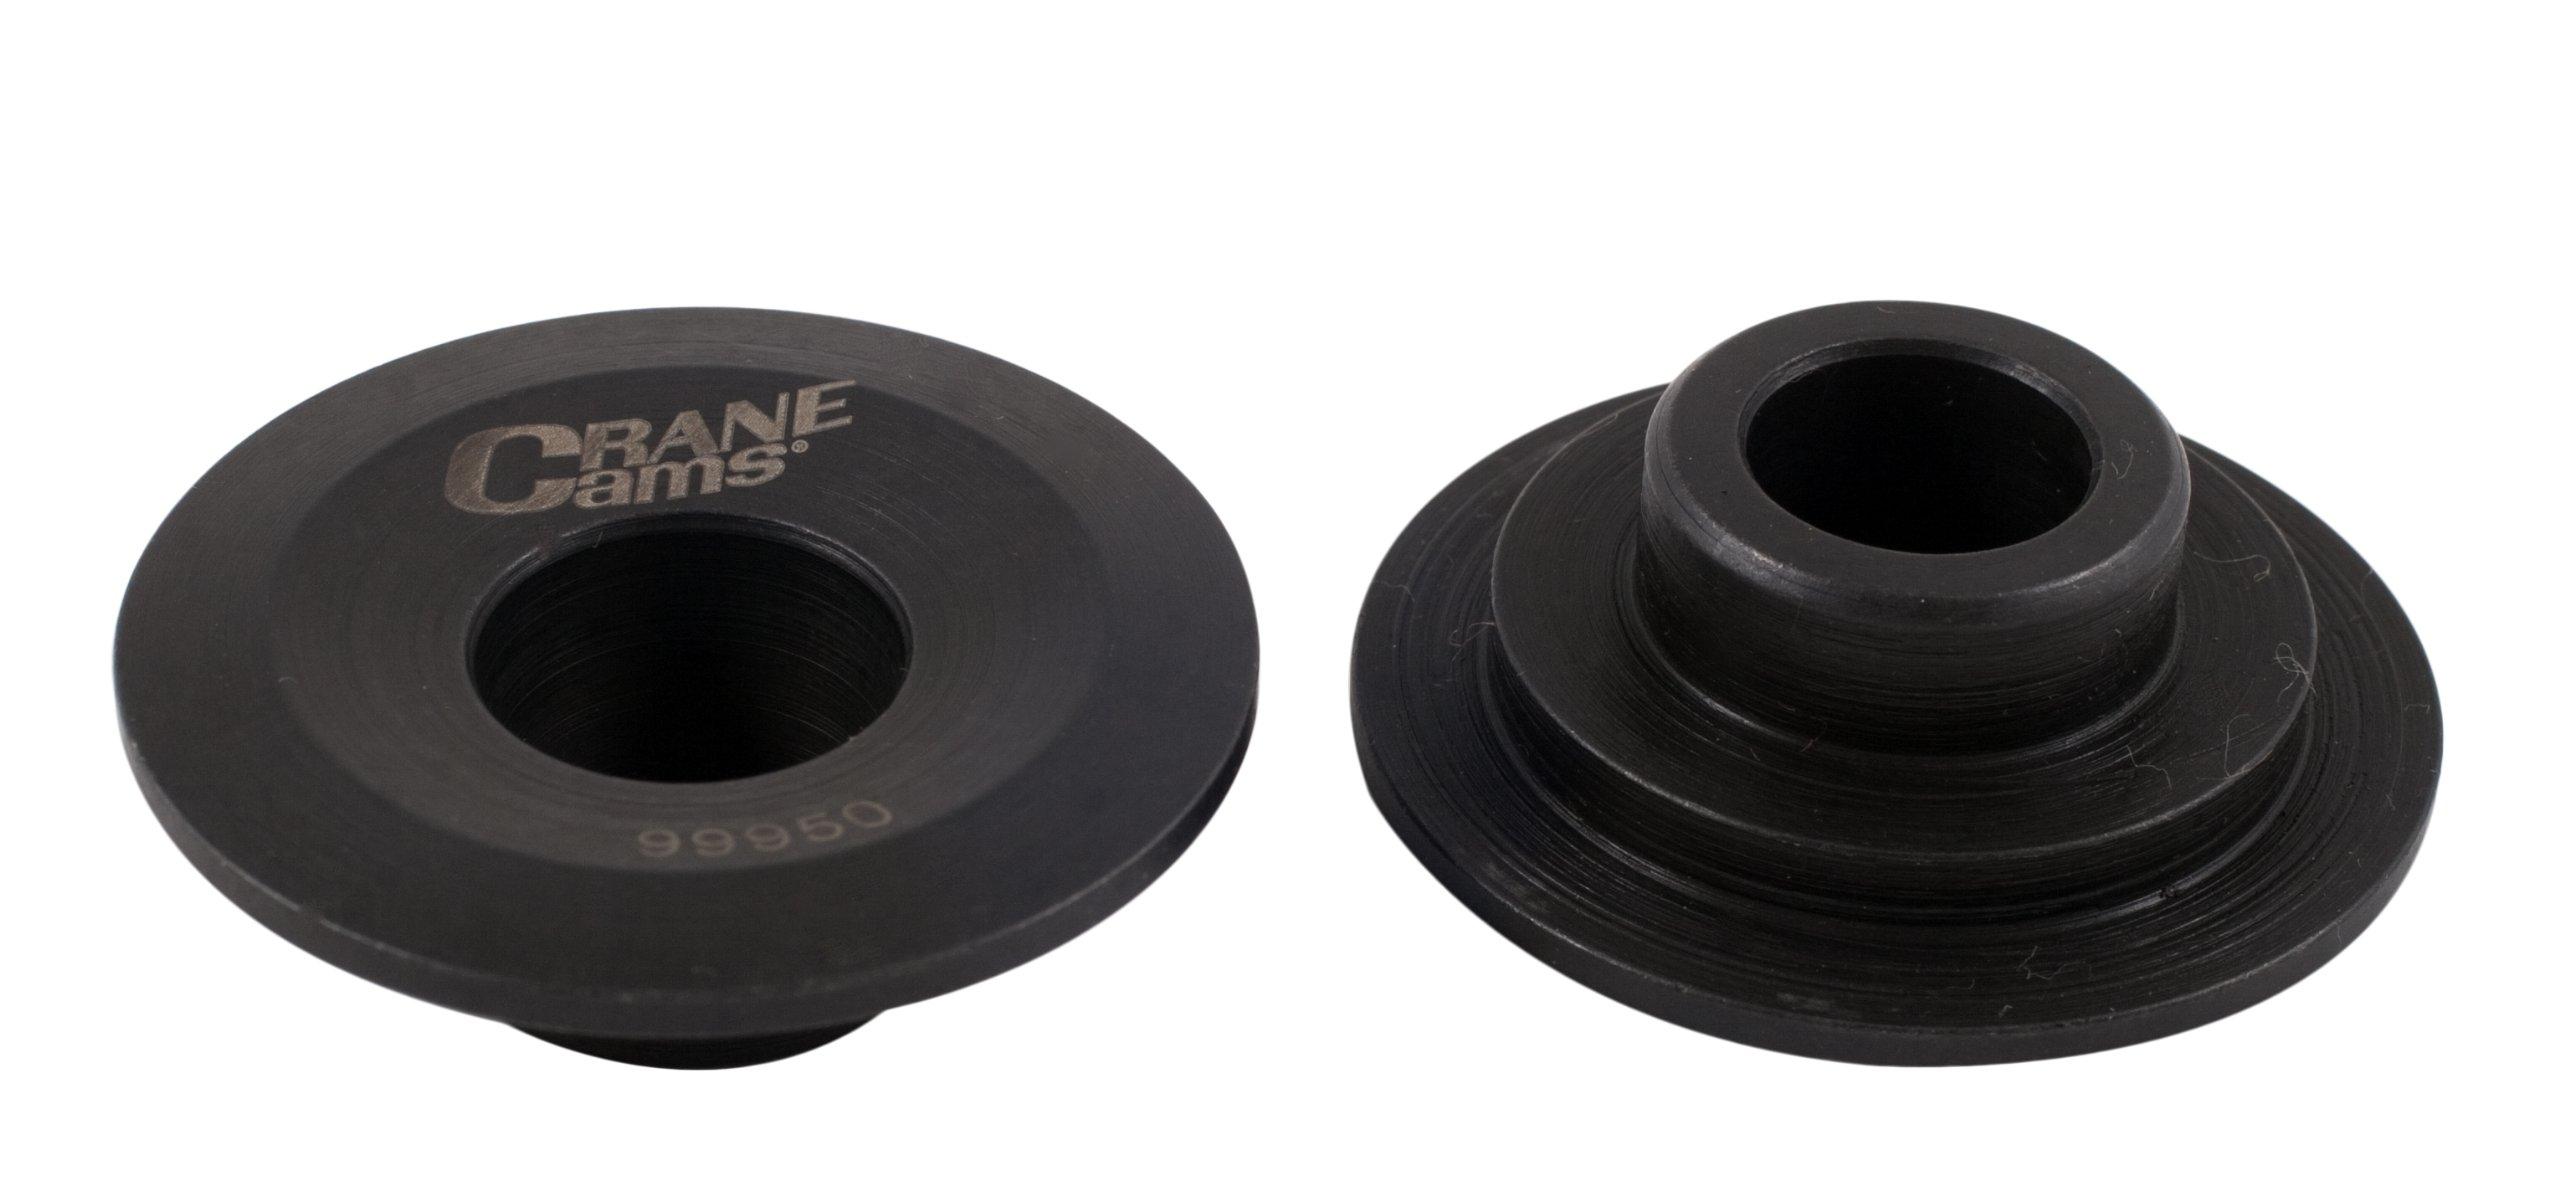 Crane Cams 99951-16 Steel Valve Spring Retainer